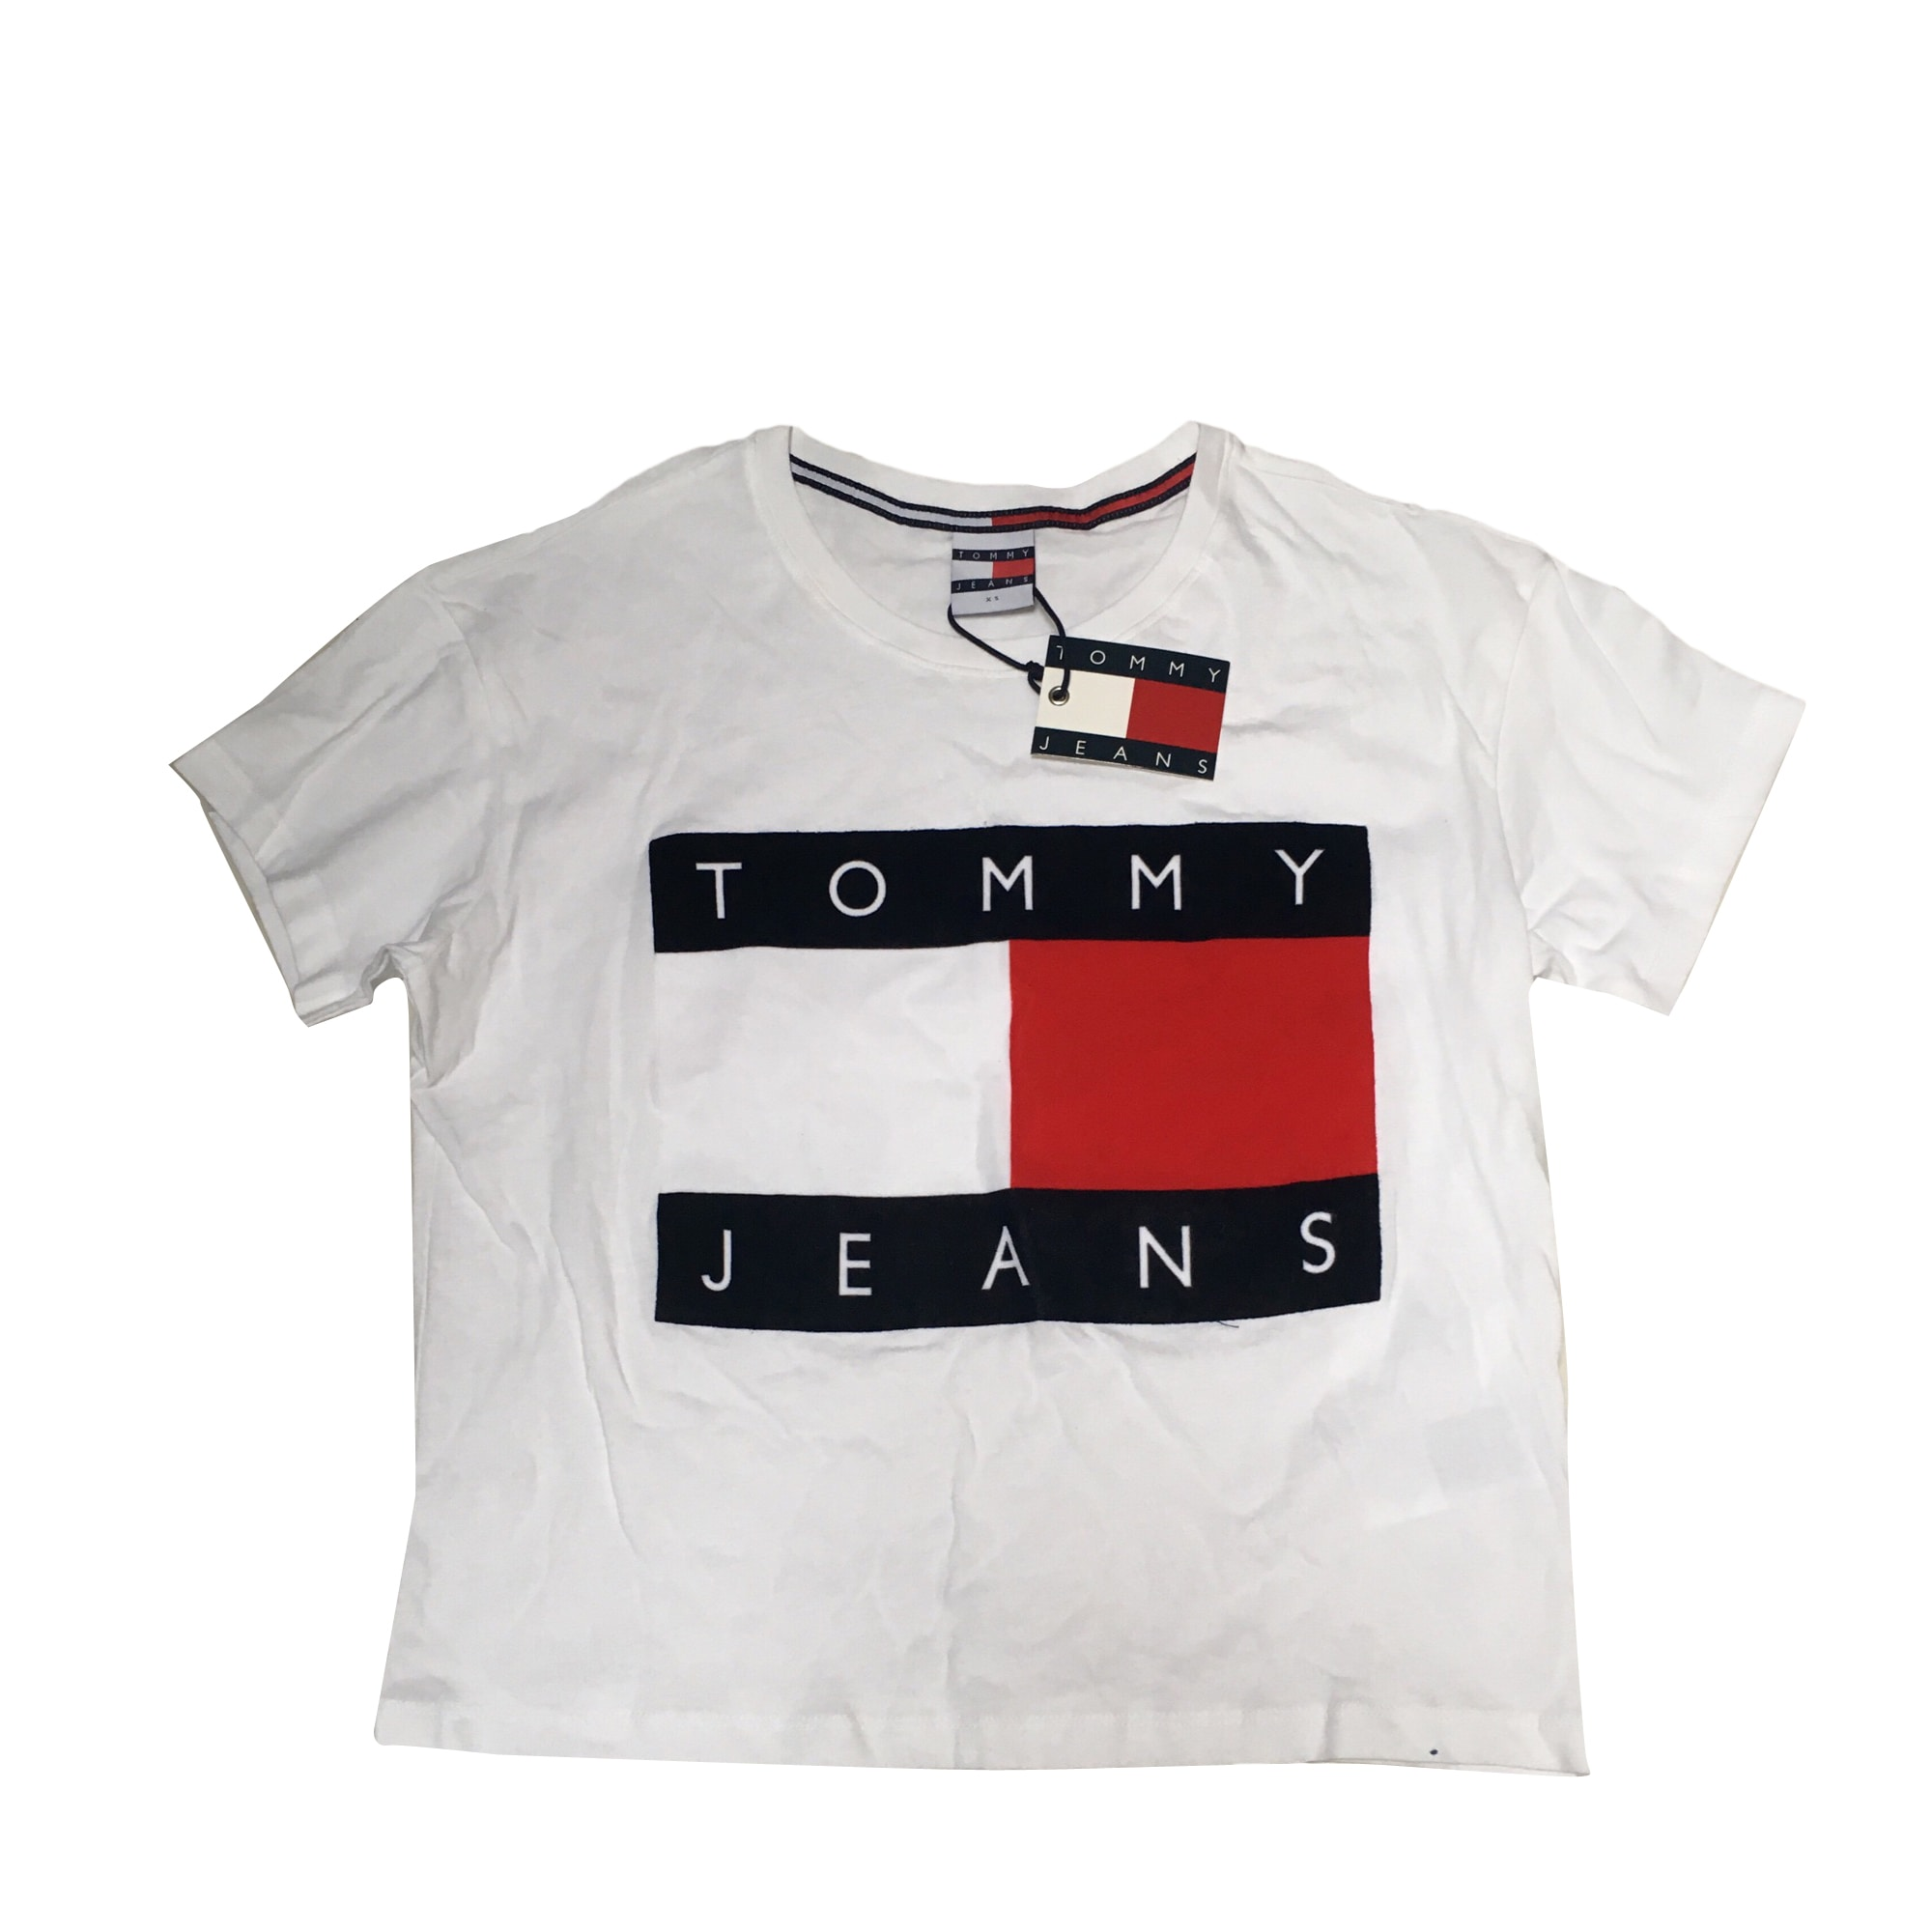 top t shirt tommy hilfiger 34 xs t0 white vendu par luxembourg26 7381418. Black Bedroom Furniture Sets. Home Design Ideas